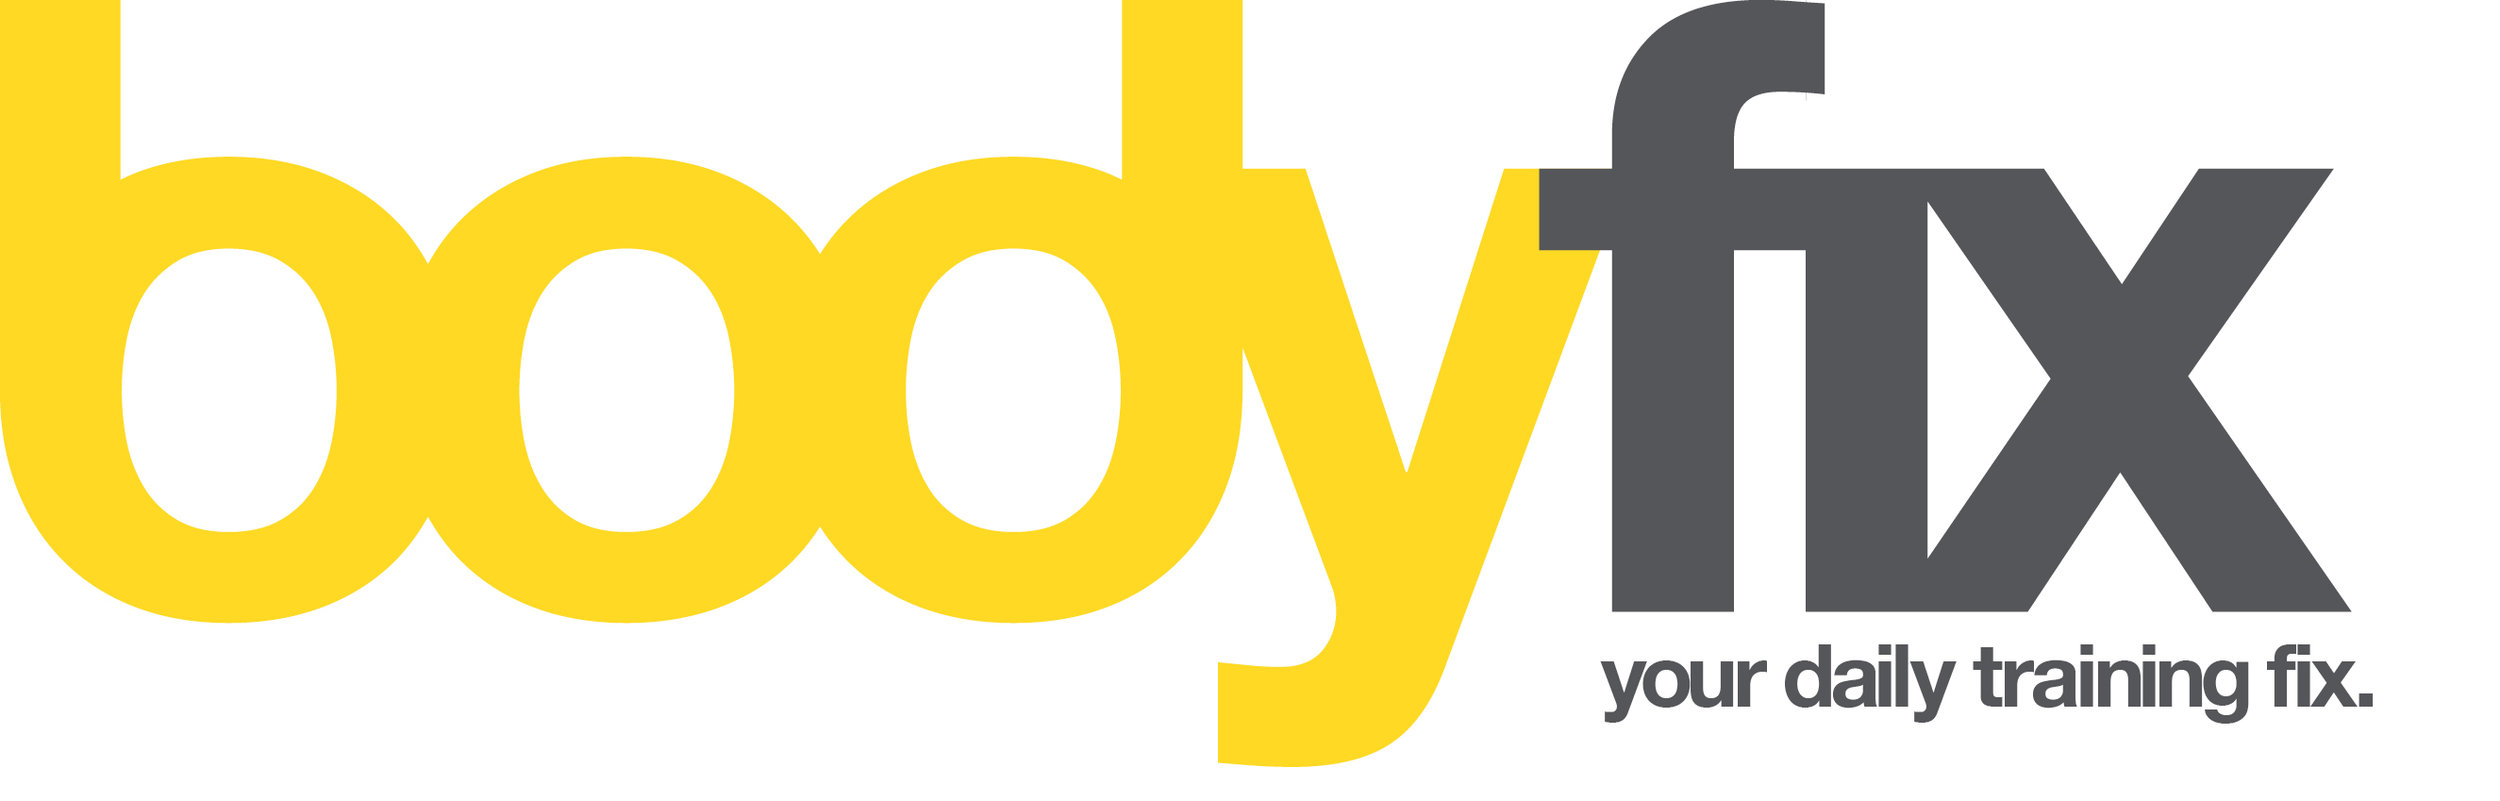 Bodyfix Logos.jpg